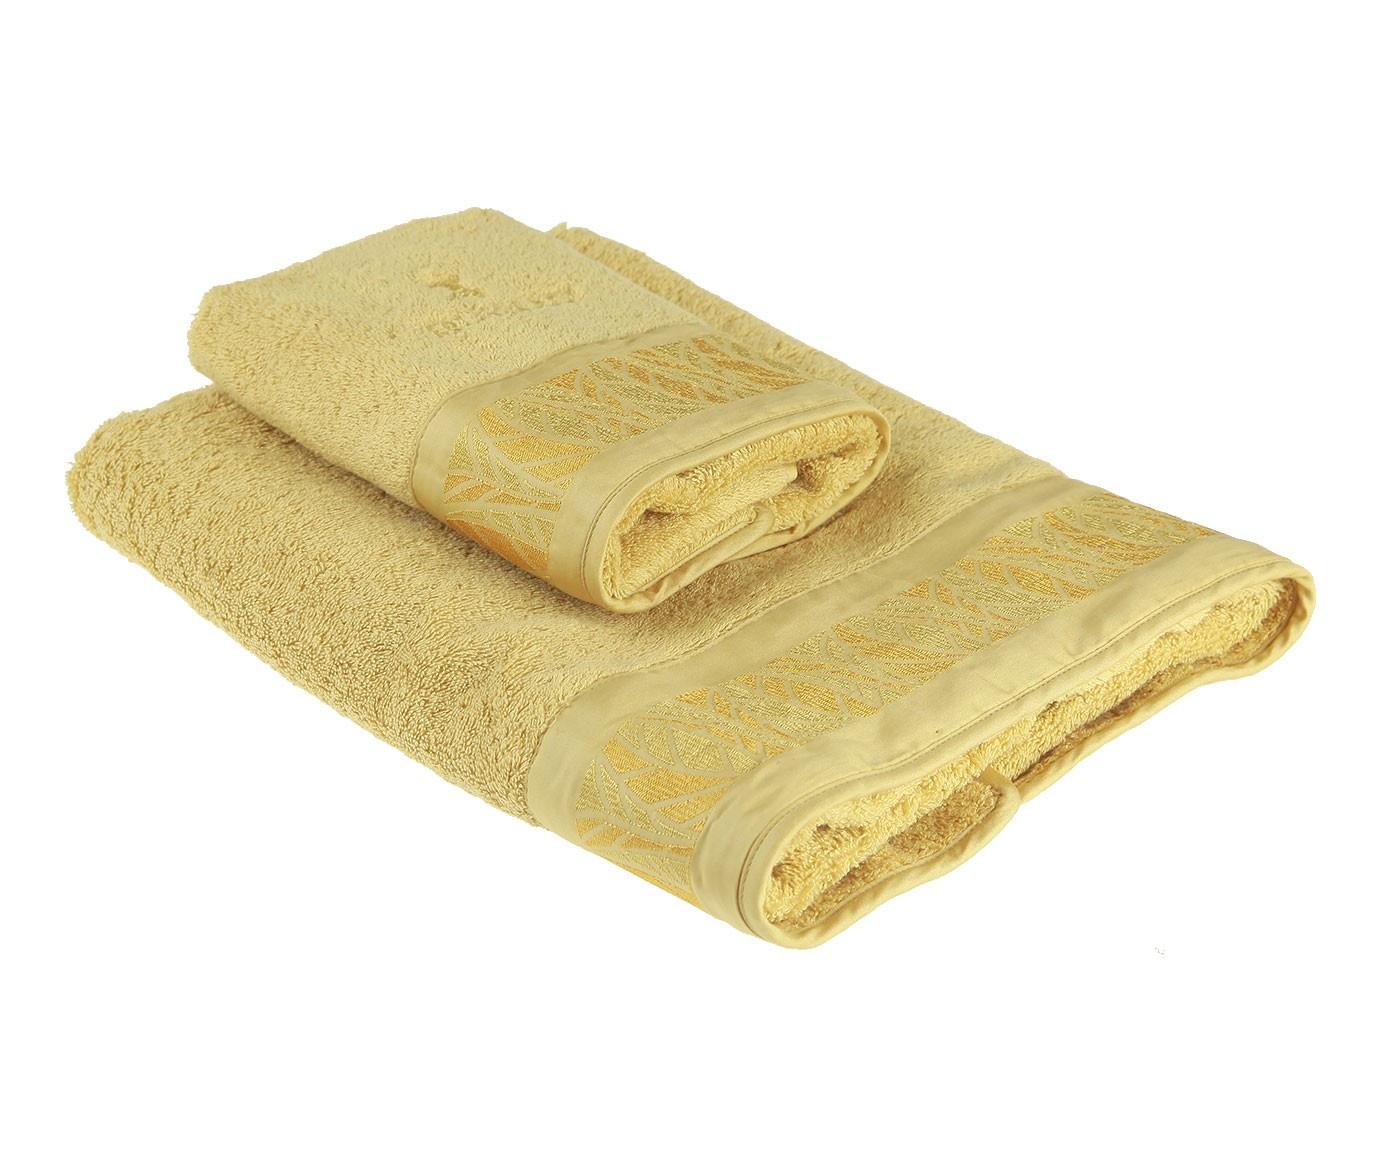 цена Набор банных полотенец Trussardi Leafy, бежевый онлайн в 2017 году